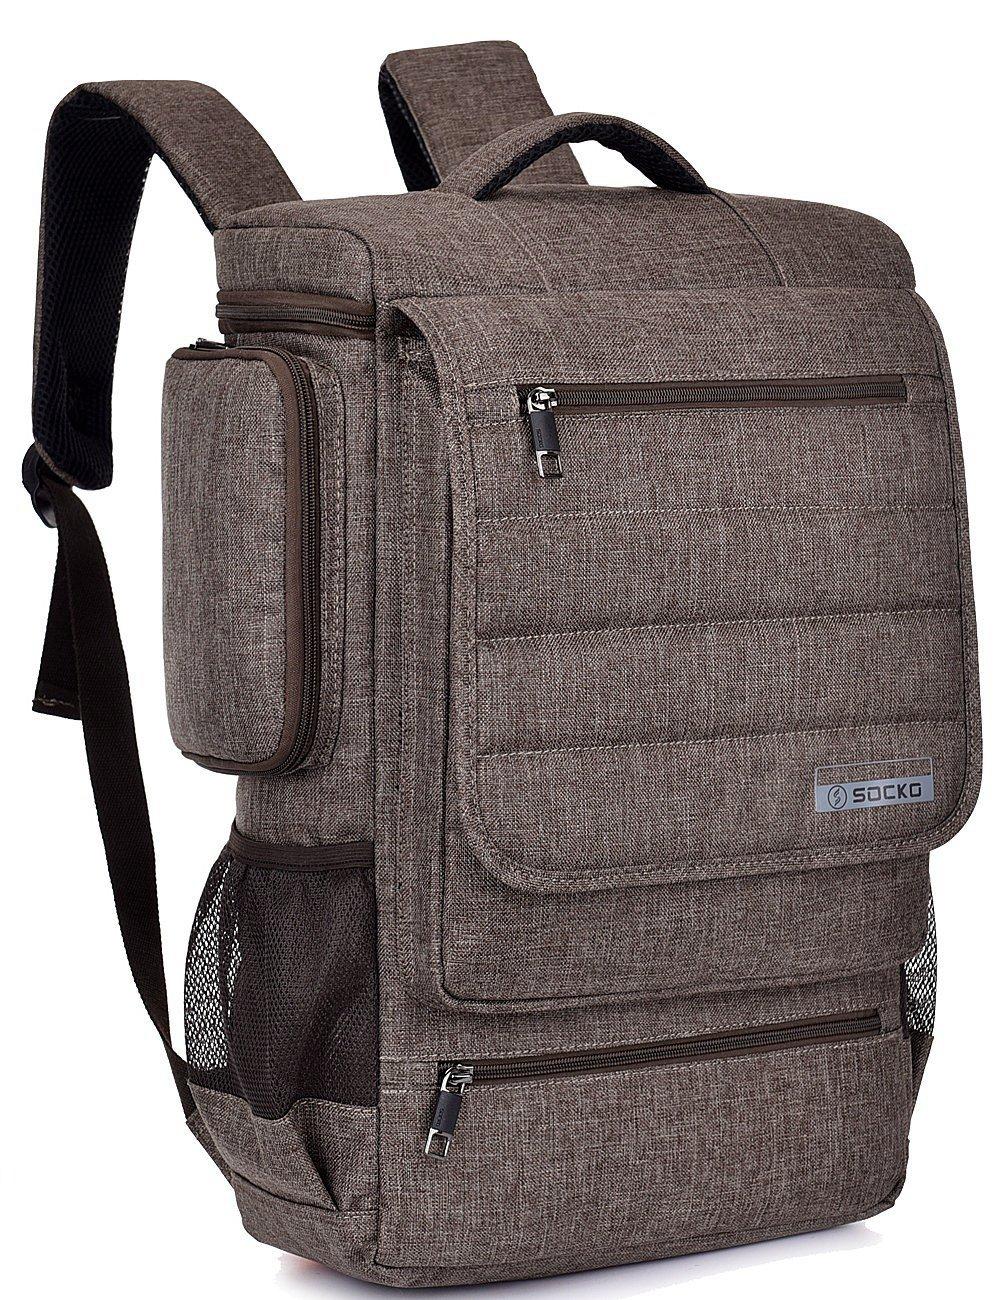 Backpack Multifunctional Knapsack Resistant Rucksack